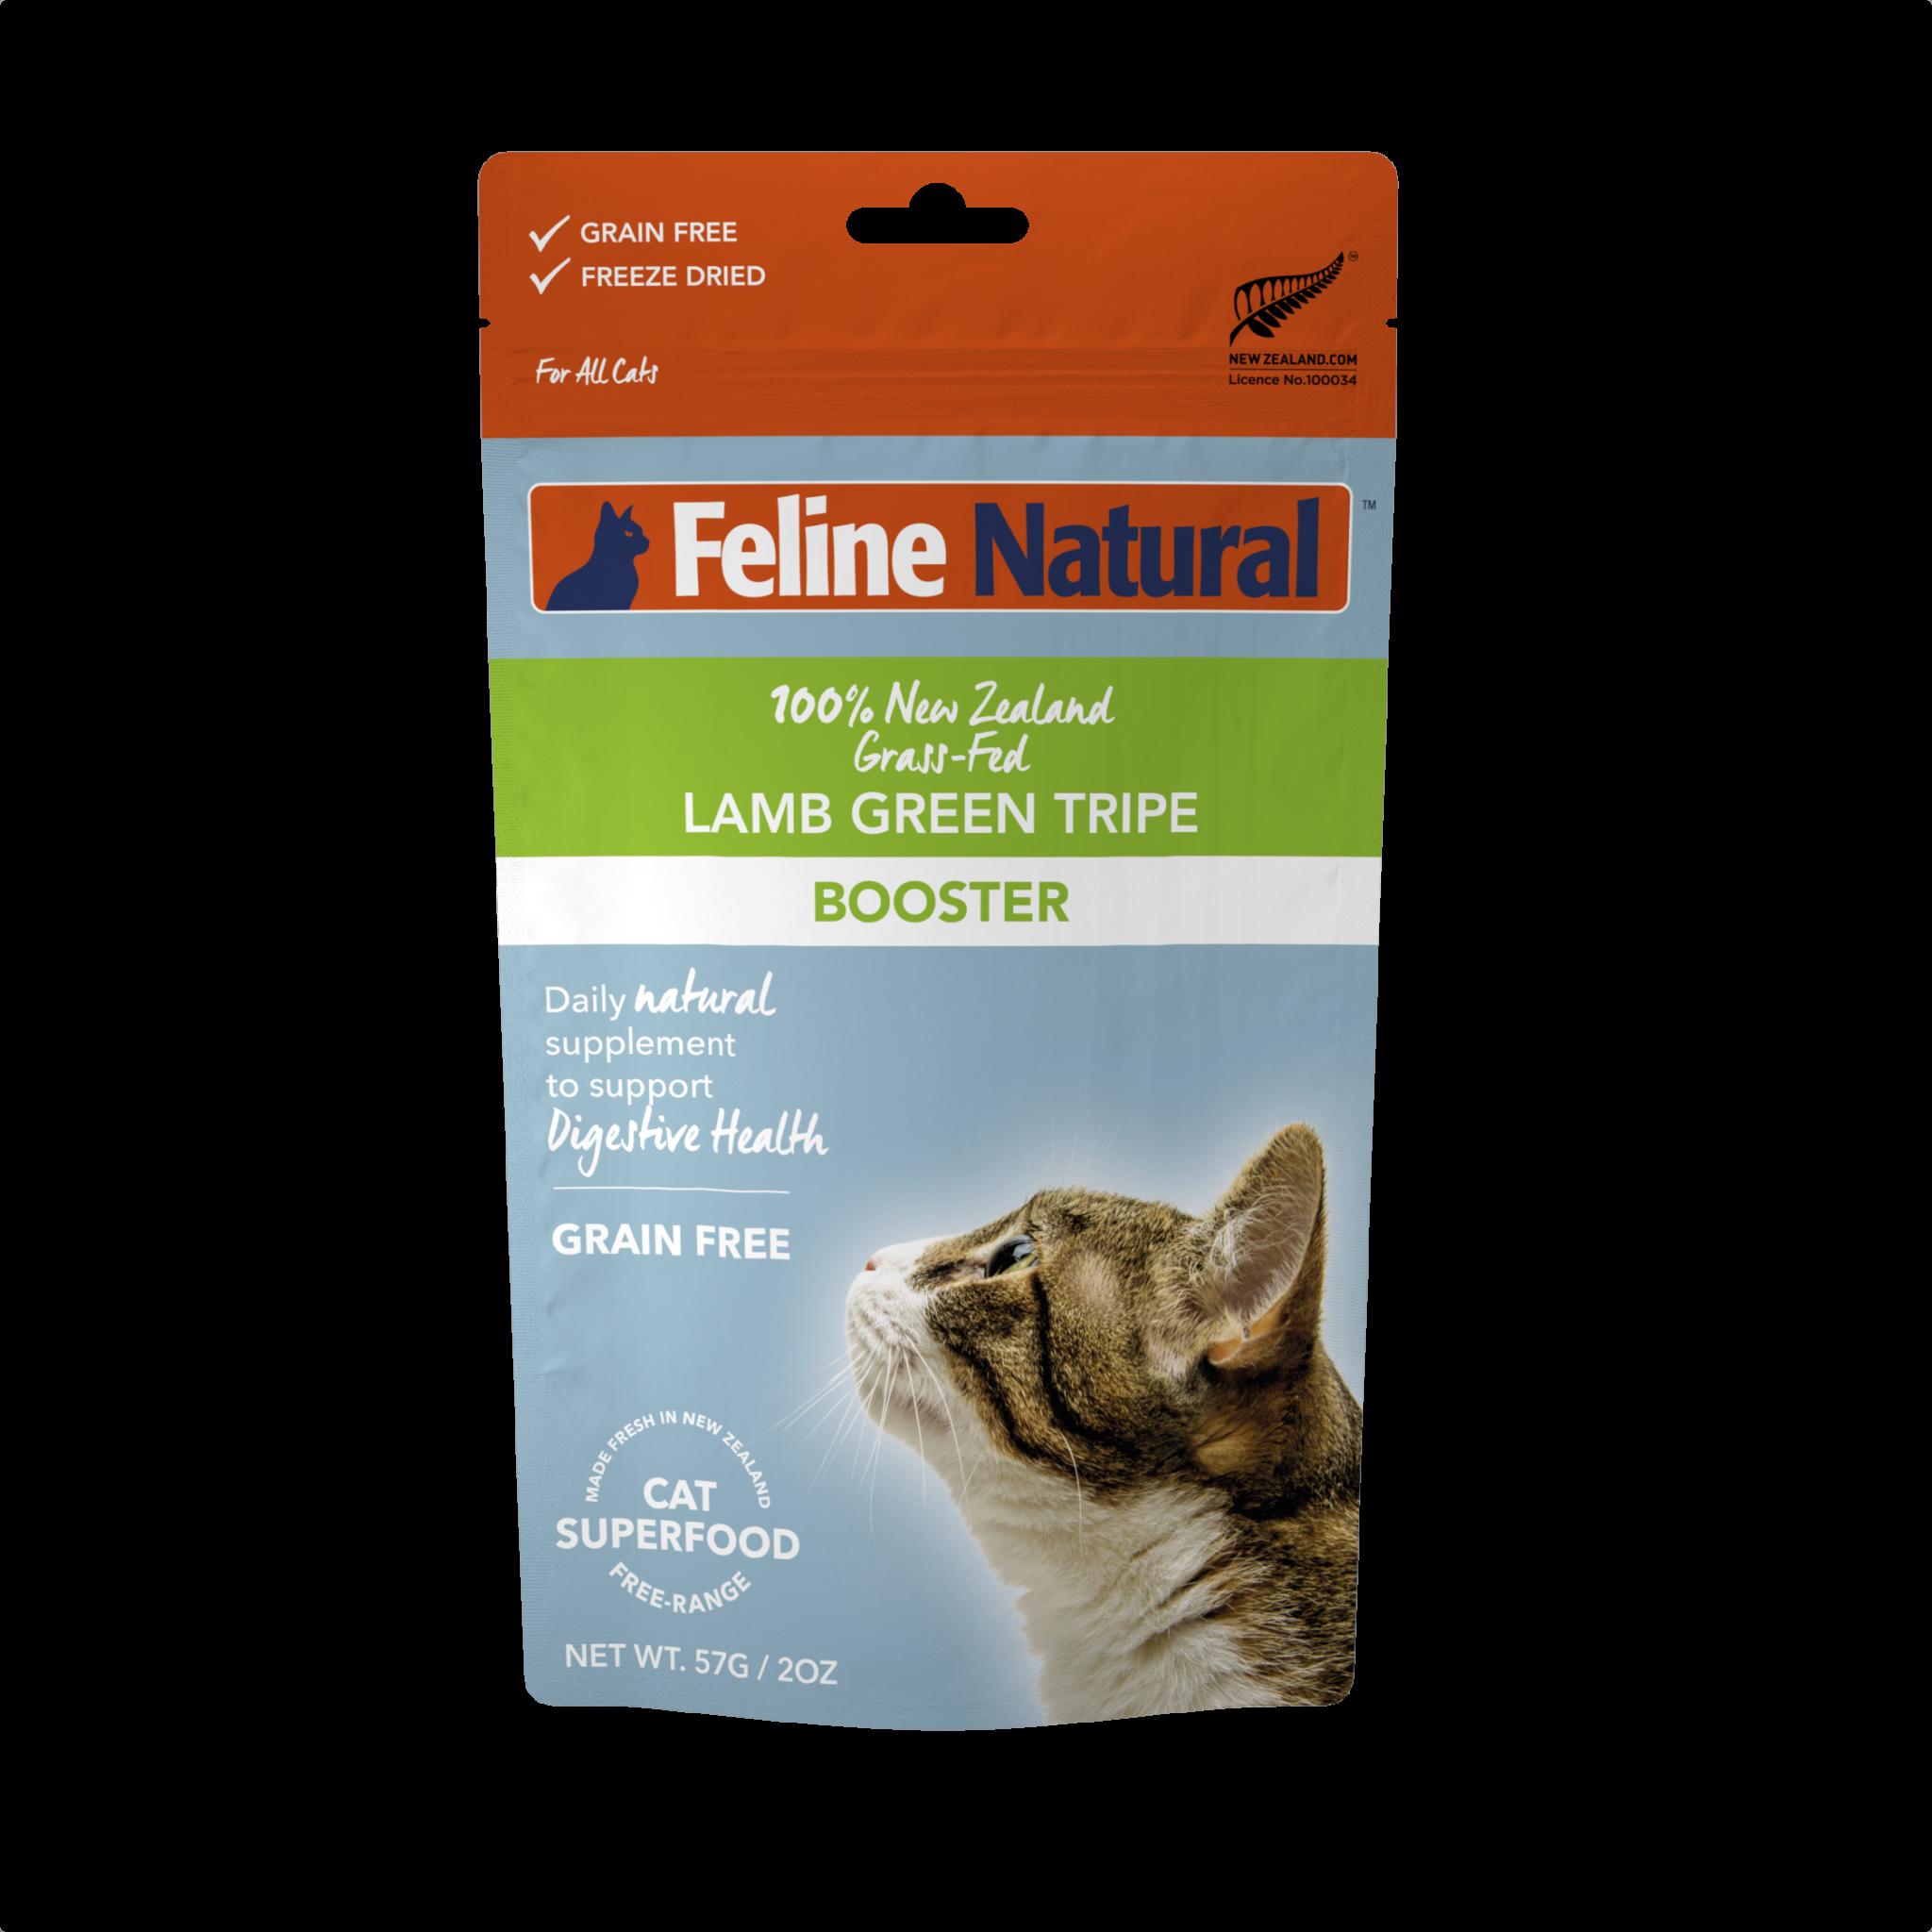 Feline Natural Feline Natural Lamb Green Tripe Freeze Dried Booster 2oz